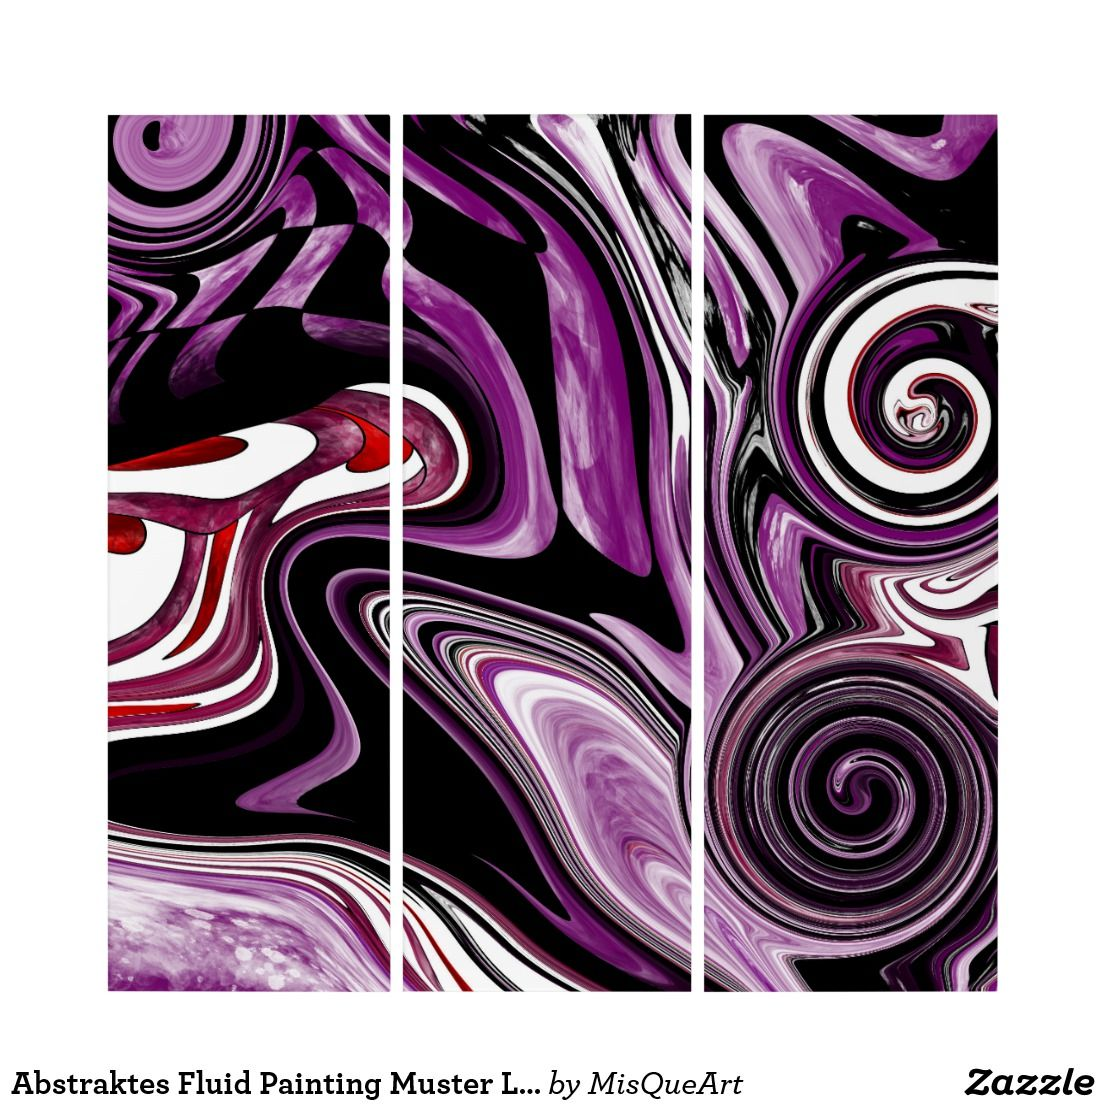 Abstraktes Fluid Painting Muster Lila Schwarz Triptychon